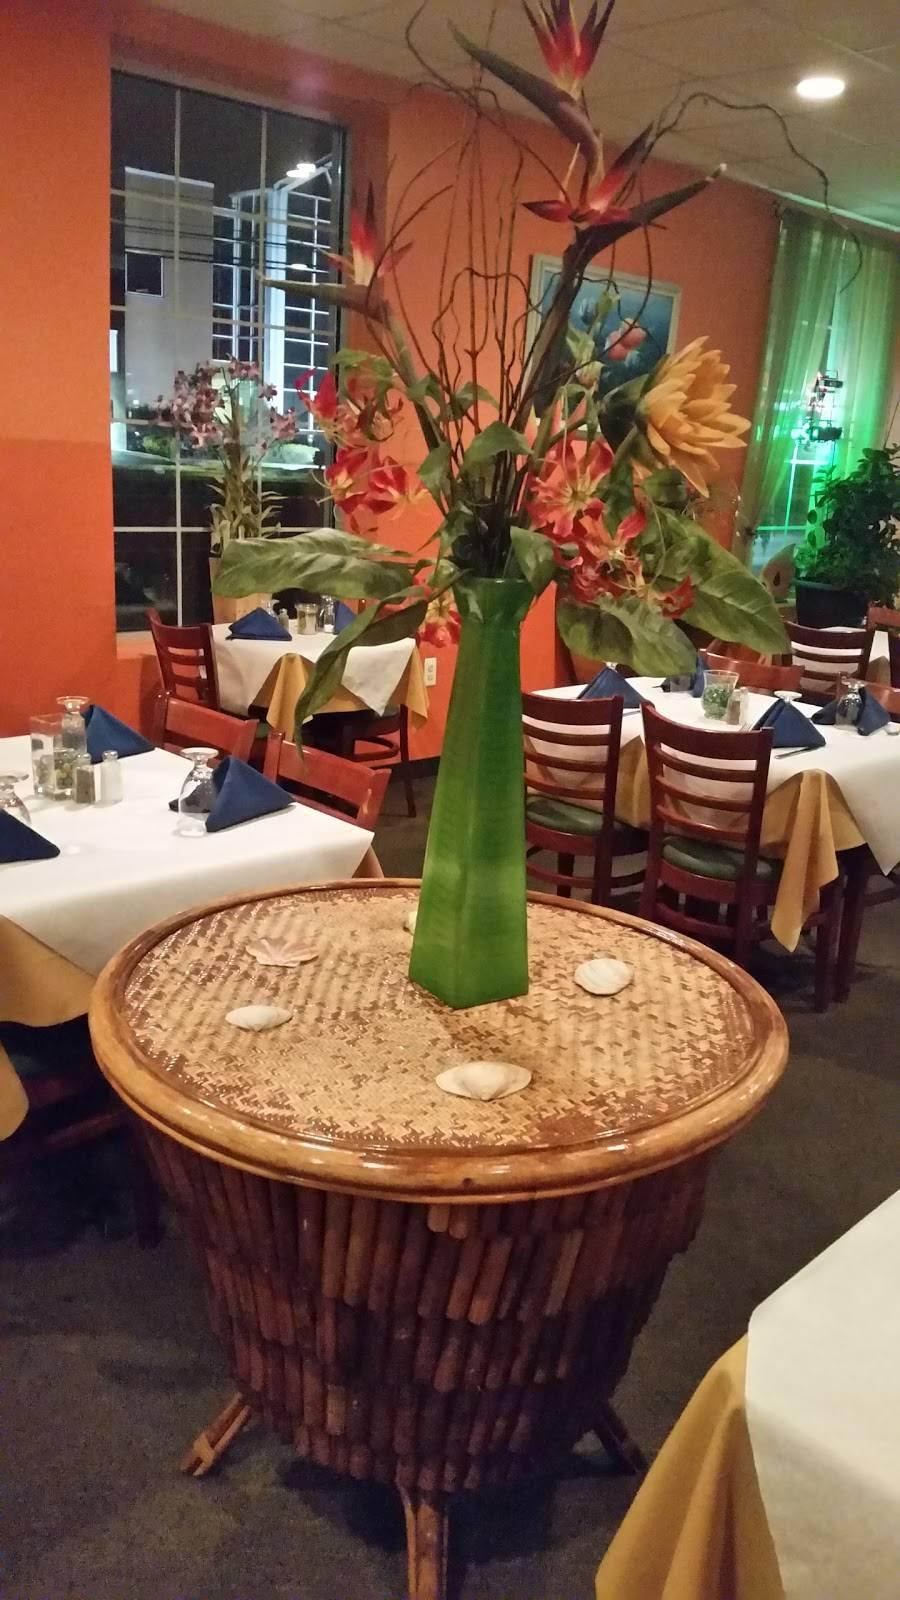 De Island Breeze Restaurant & Lounge | restaurant | 676 Franklin Blvd, Somerset, NJ 08873, USA | 7322148611 OR +1 732-214-8611